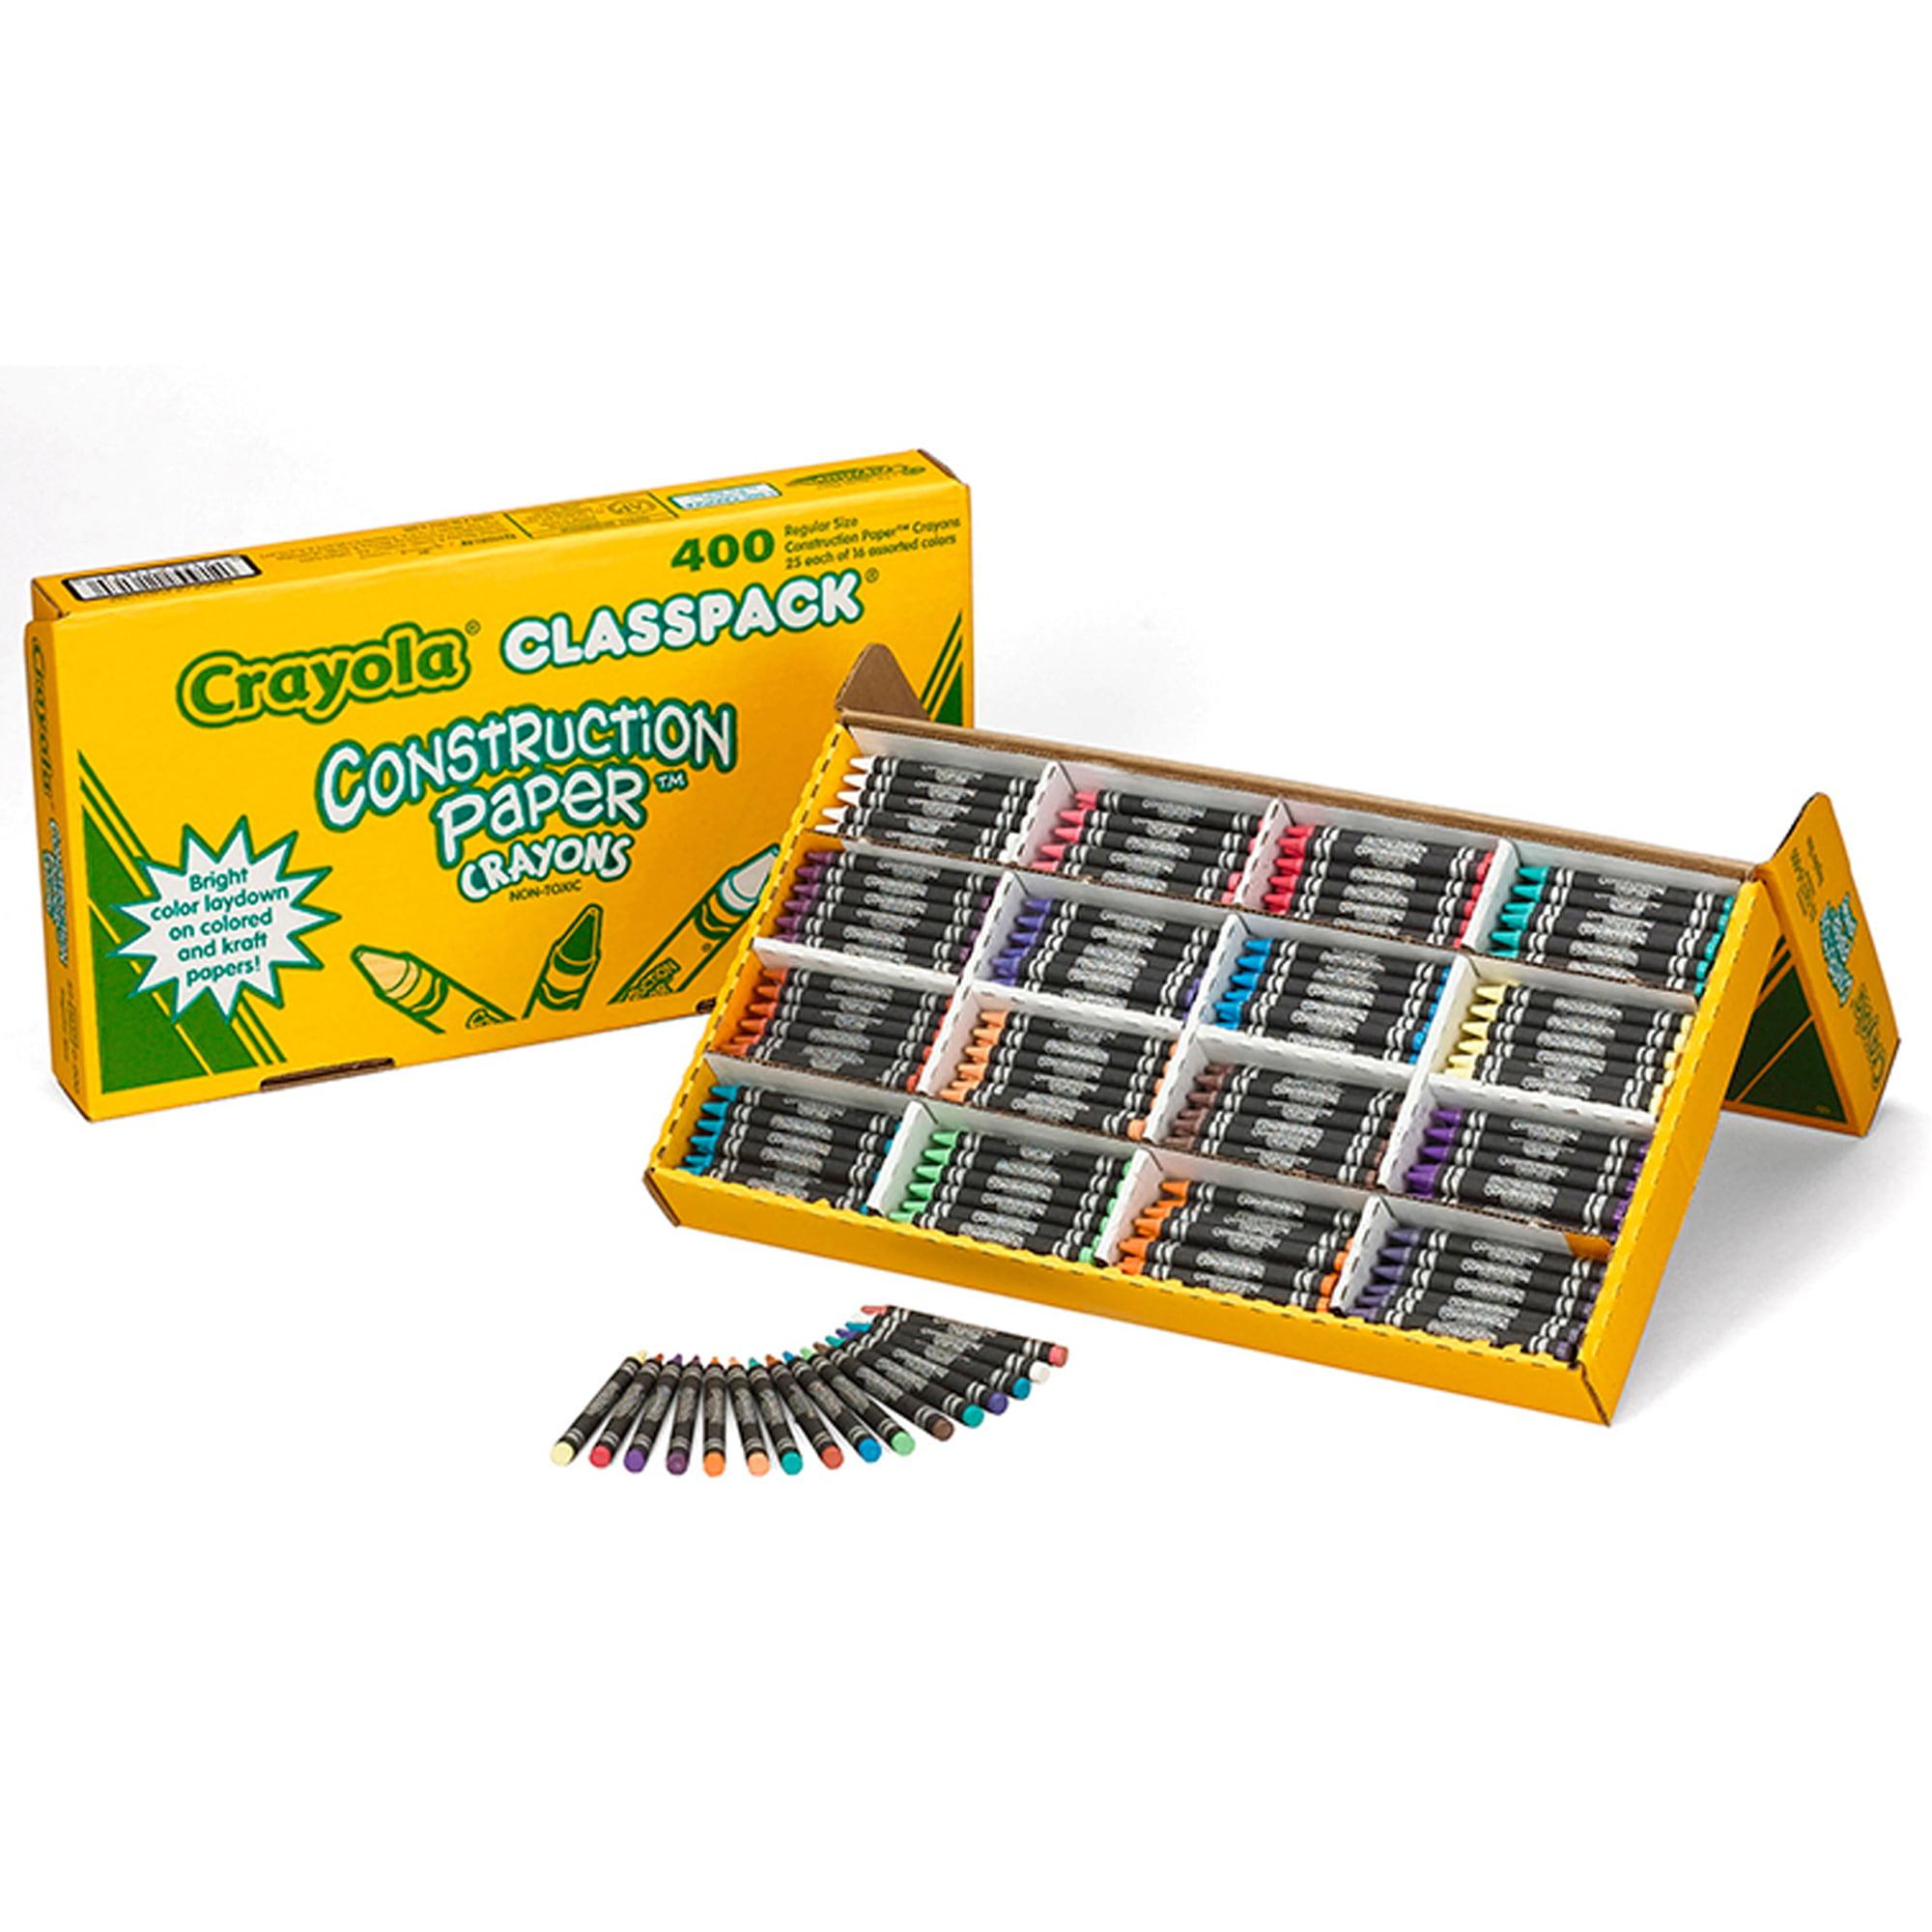 Crayola® Construction Paper Crayons Classpack